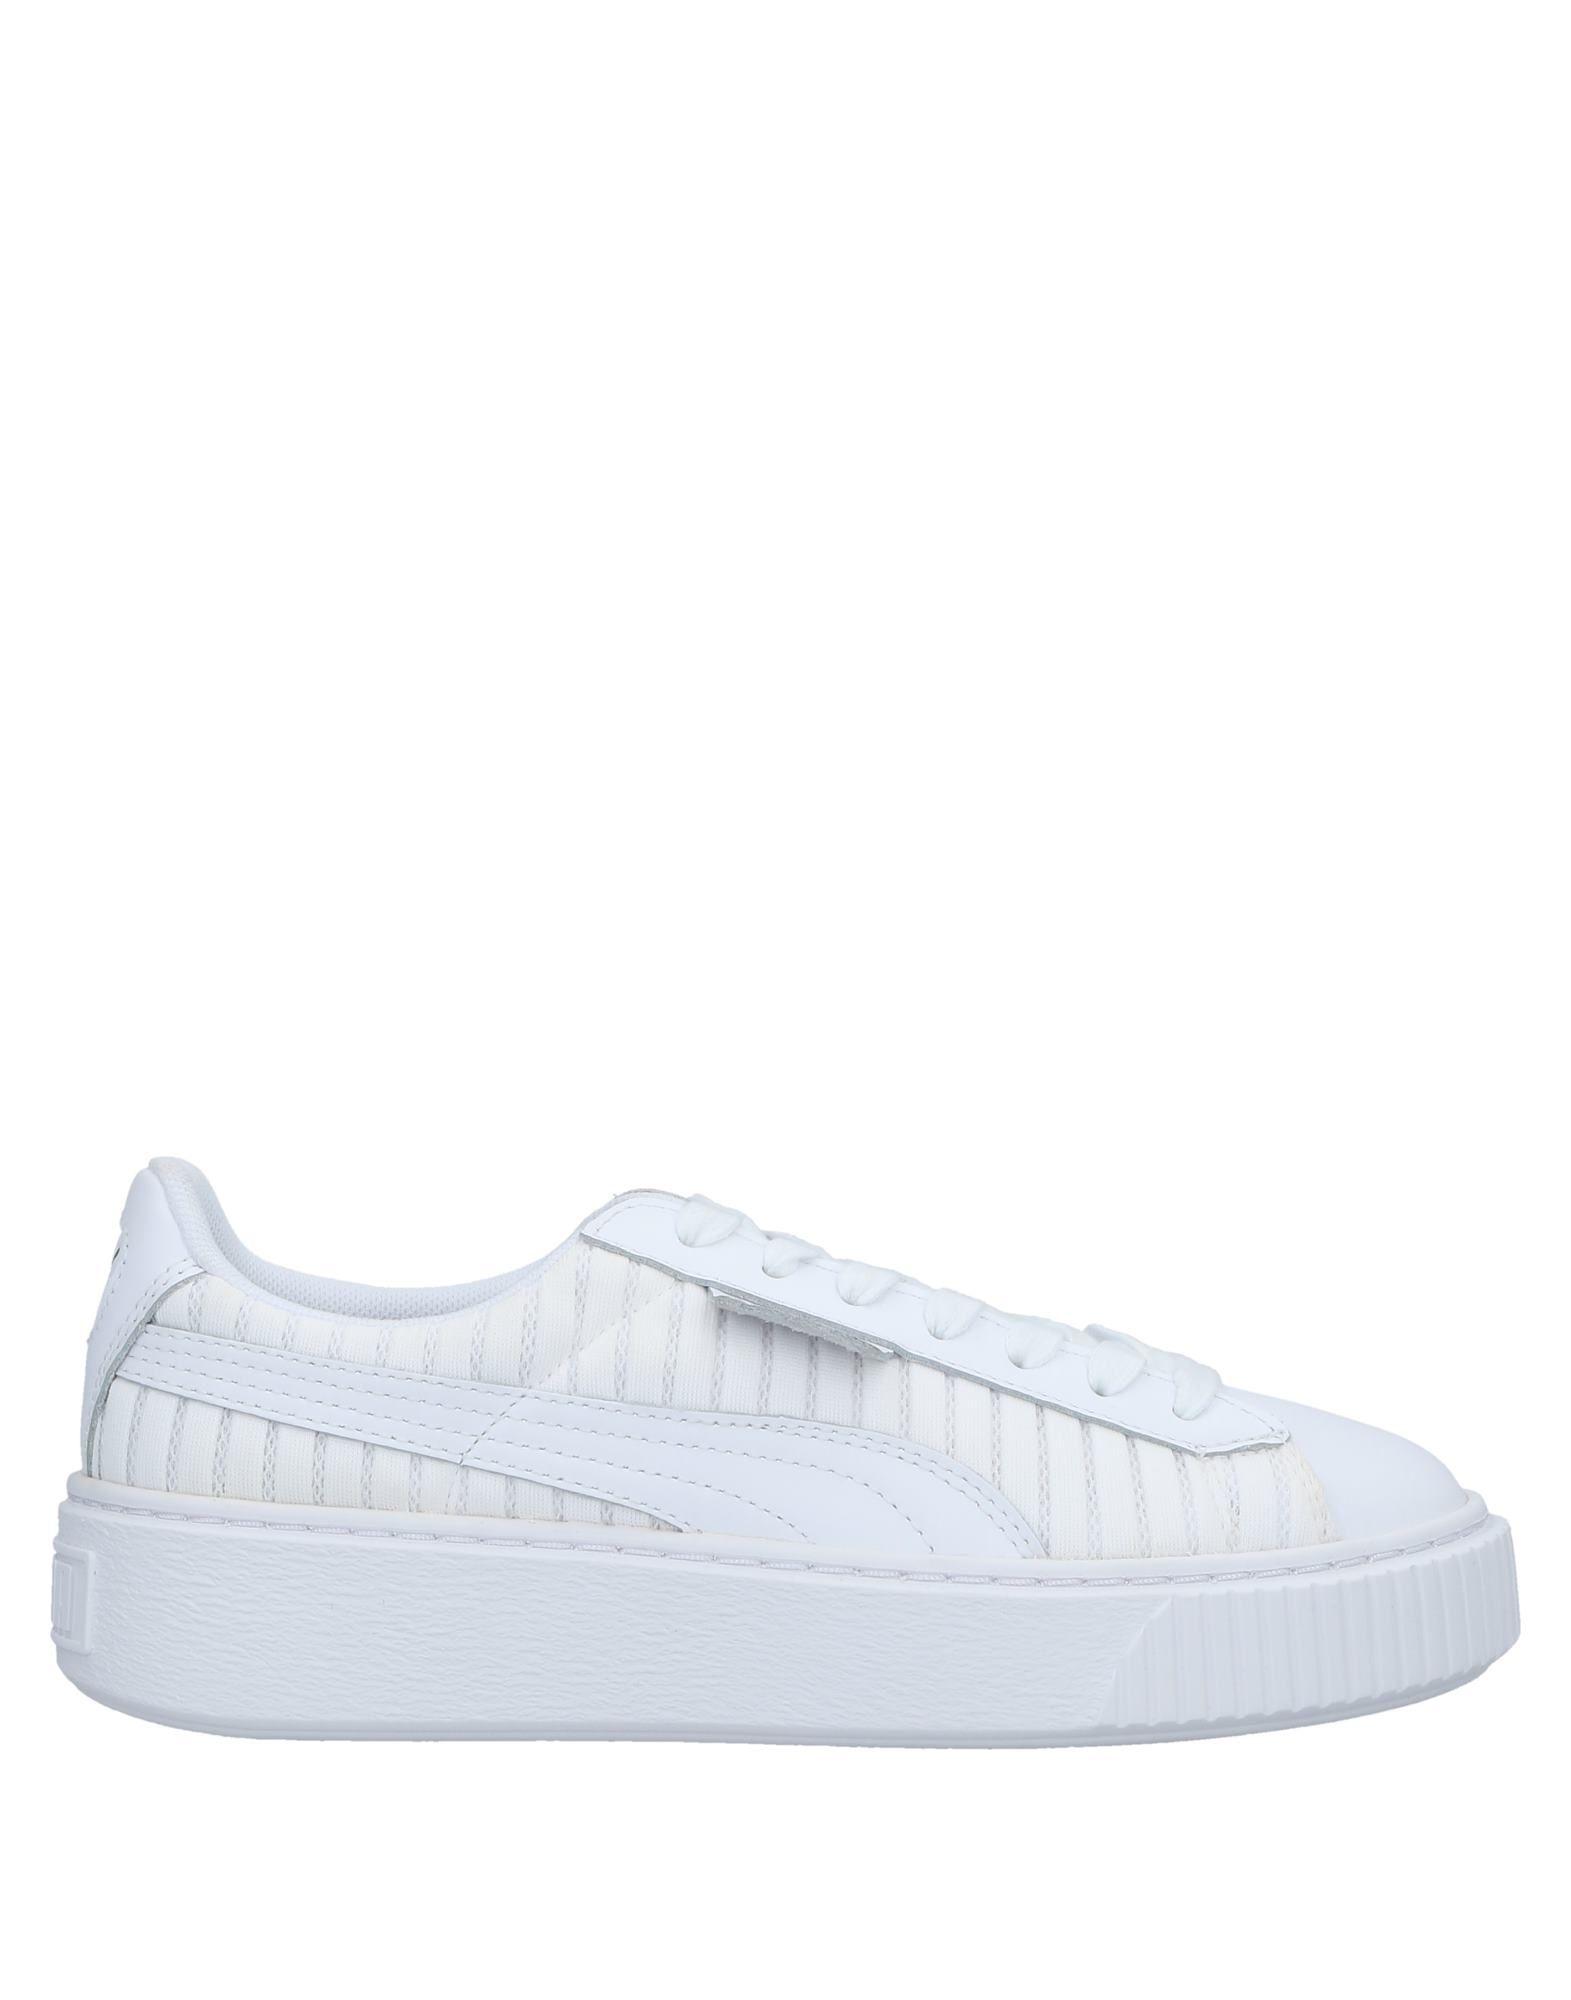 Puma Sneakers Damen  Schuhe 11537572LB Gute Qualität beliebte Schuhe  cc459e